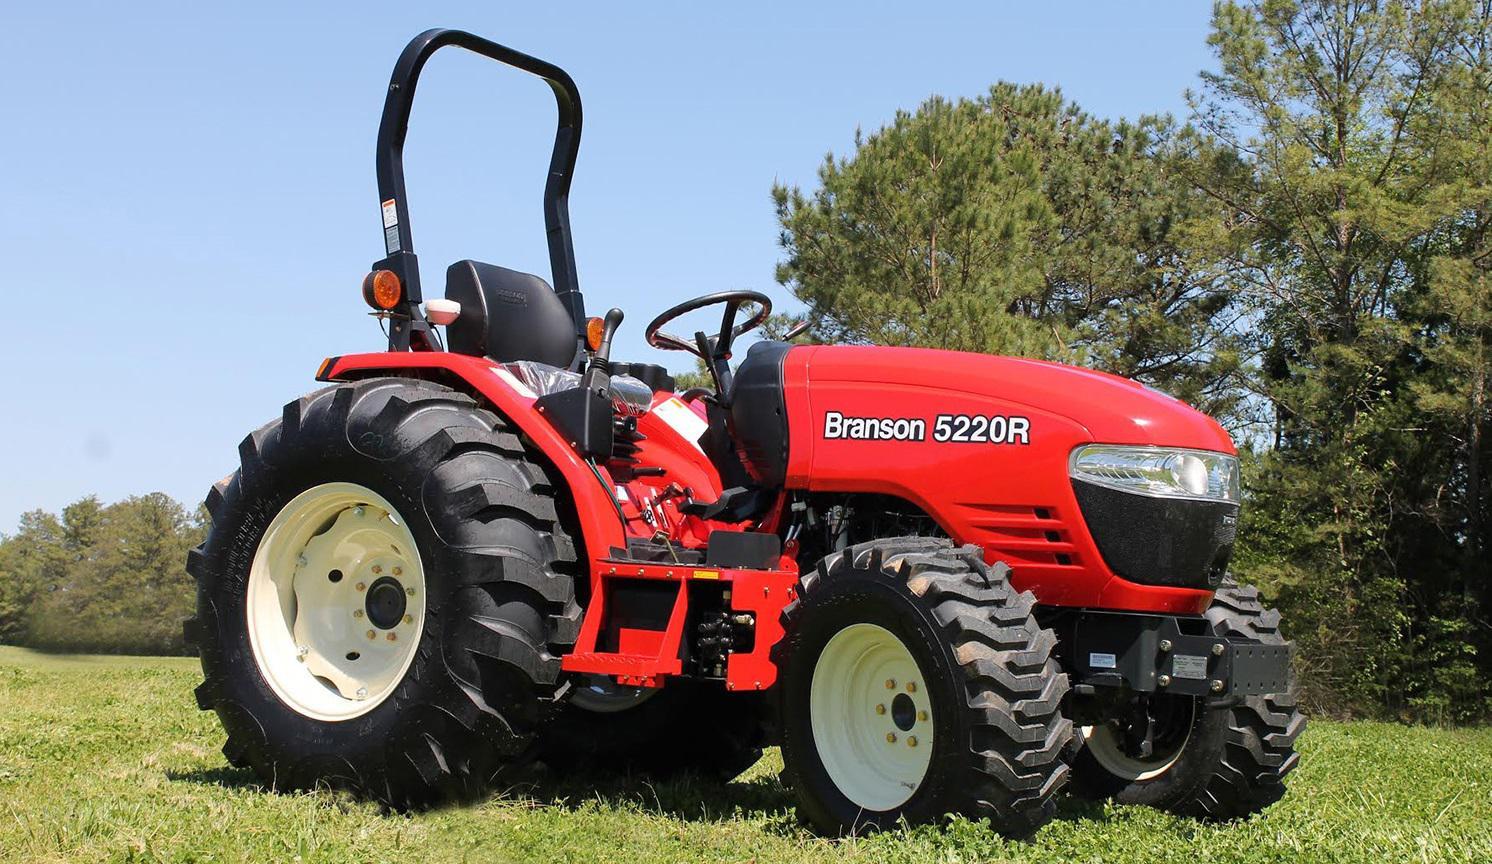 Branson 5220R Tractor Midstate Turf & Tractor, LLC